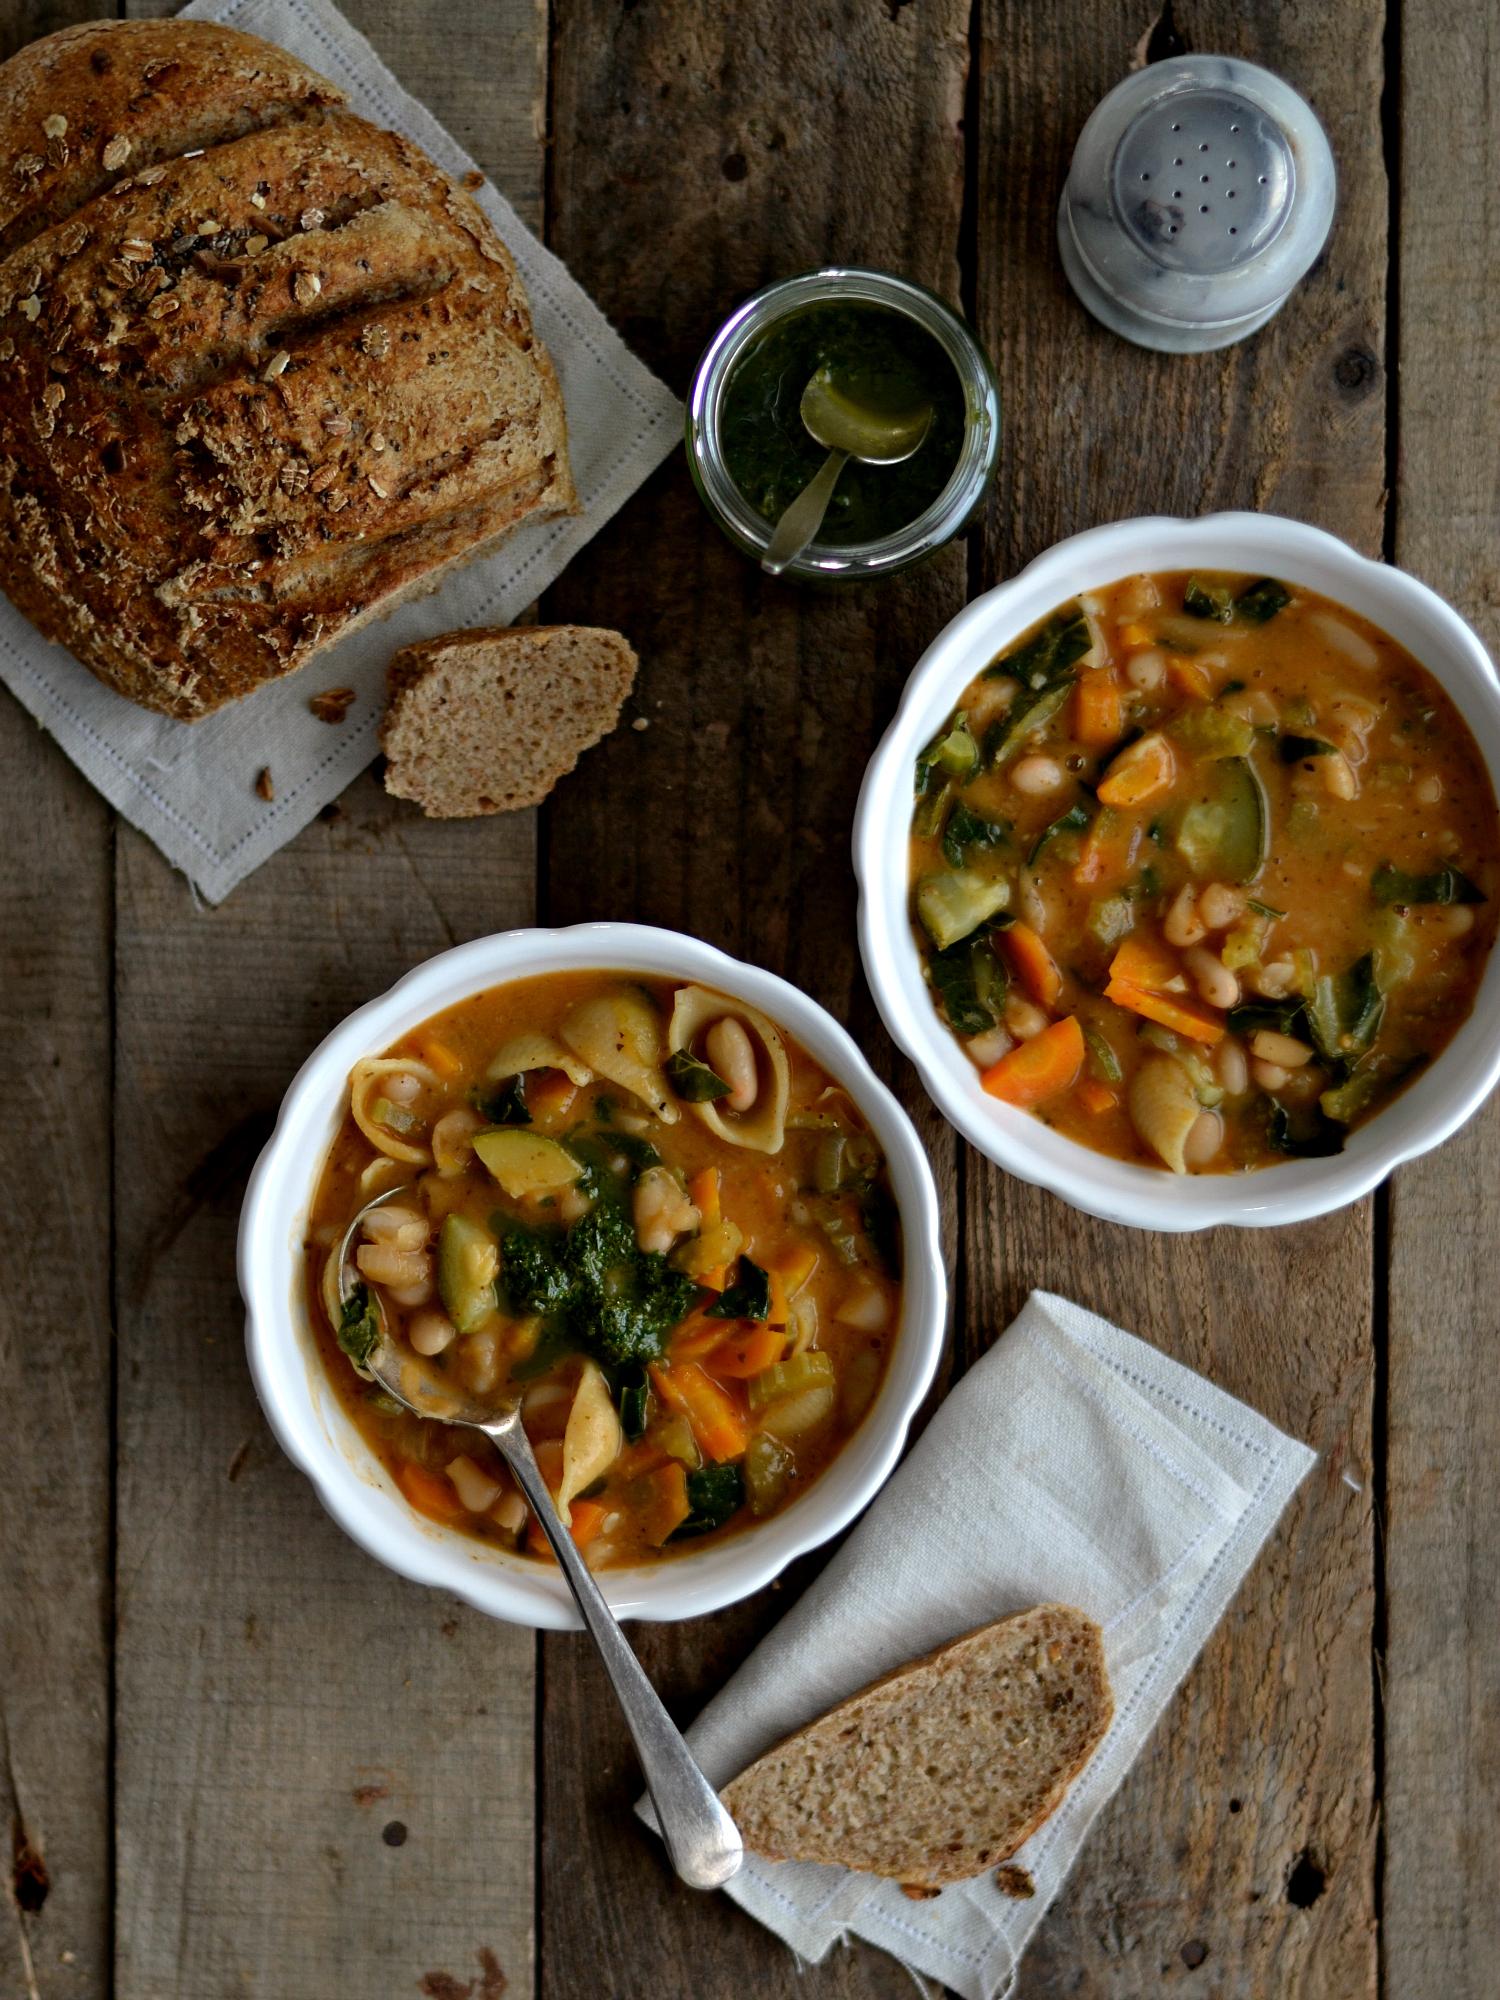 Comida de conforto minestrone compassionate cuisine - Comidas vegetarianas ricas ...